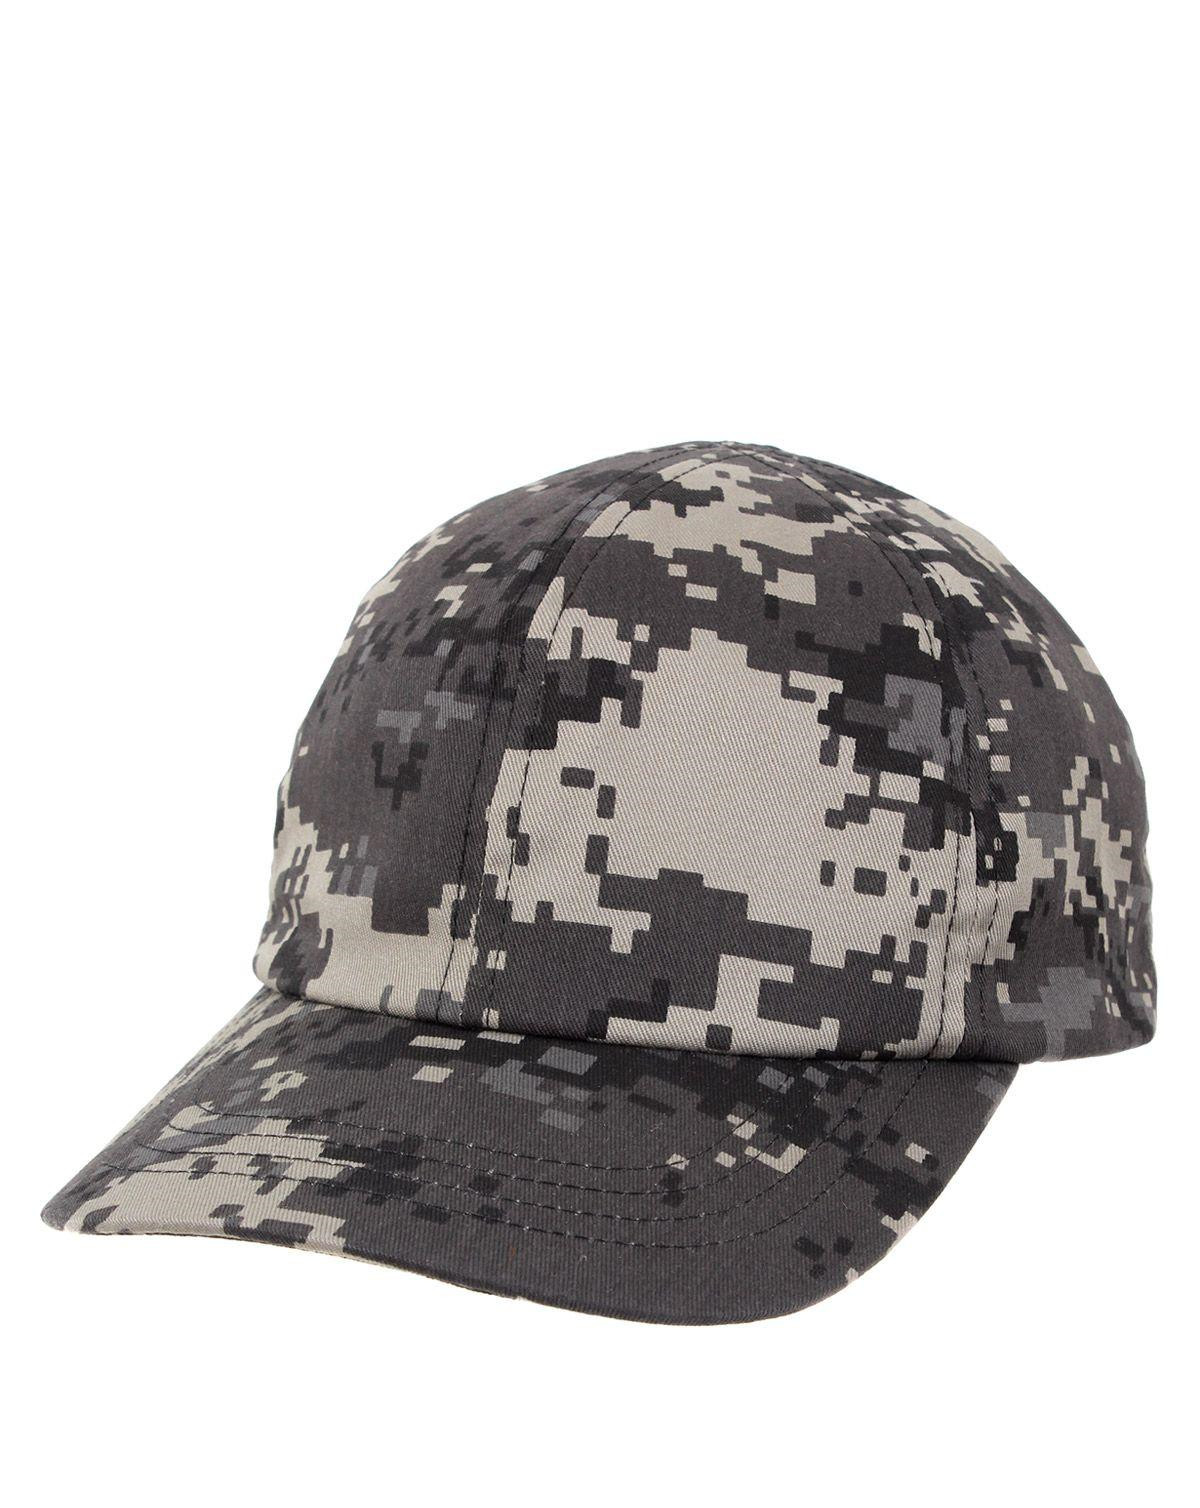 Image of   Rothco Camouflage Baseball Cap til Børn (Dæmpet Urban Digital Camo, One Size)